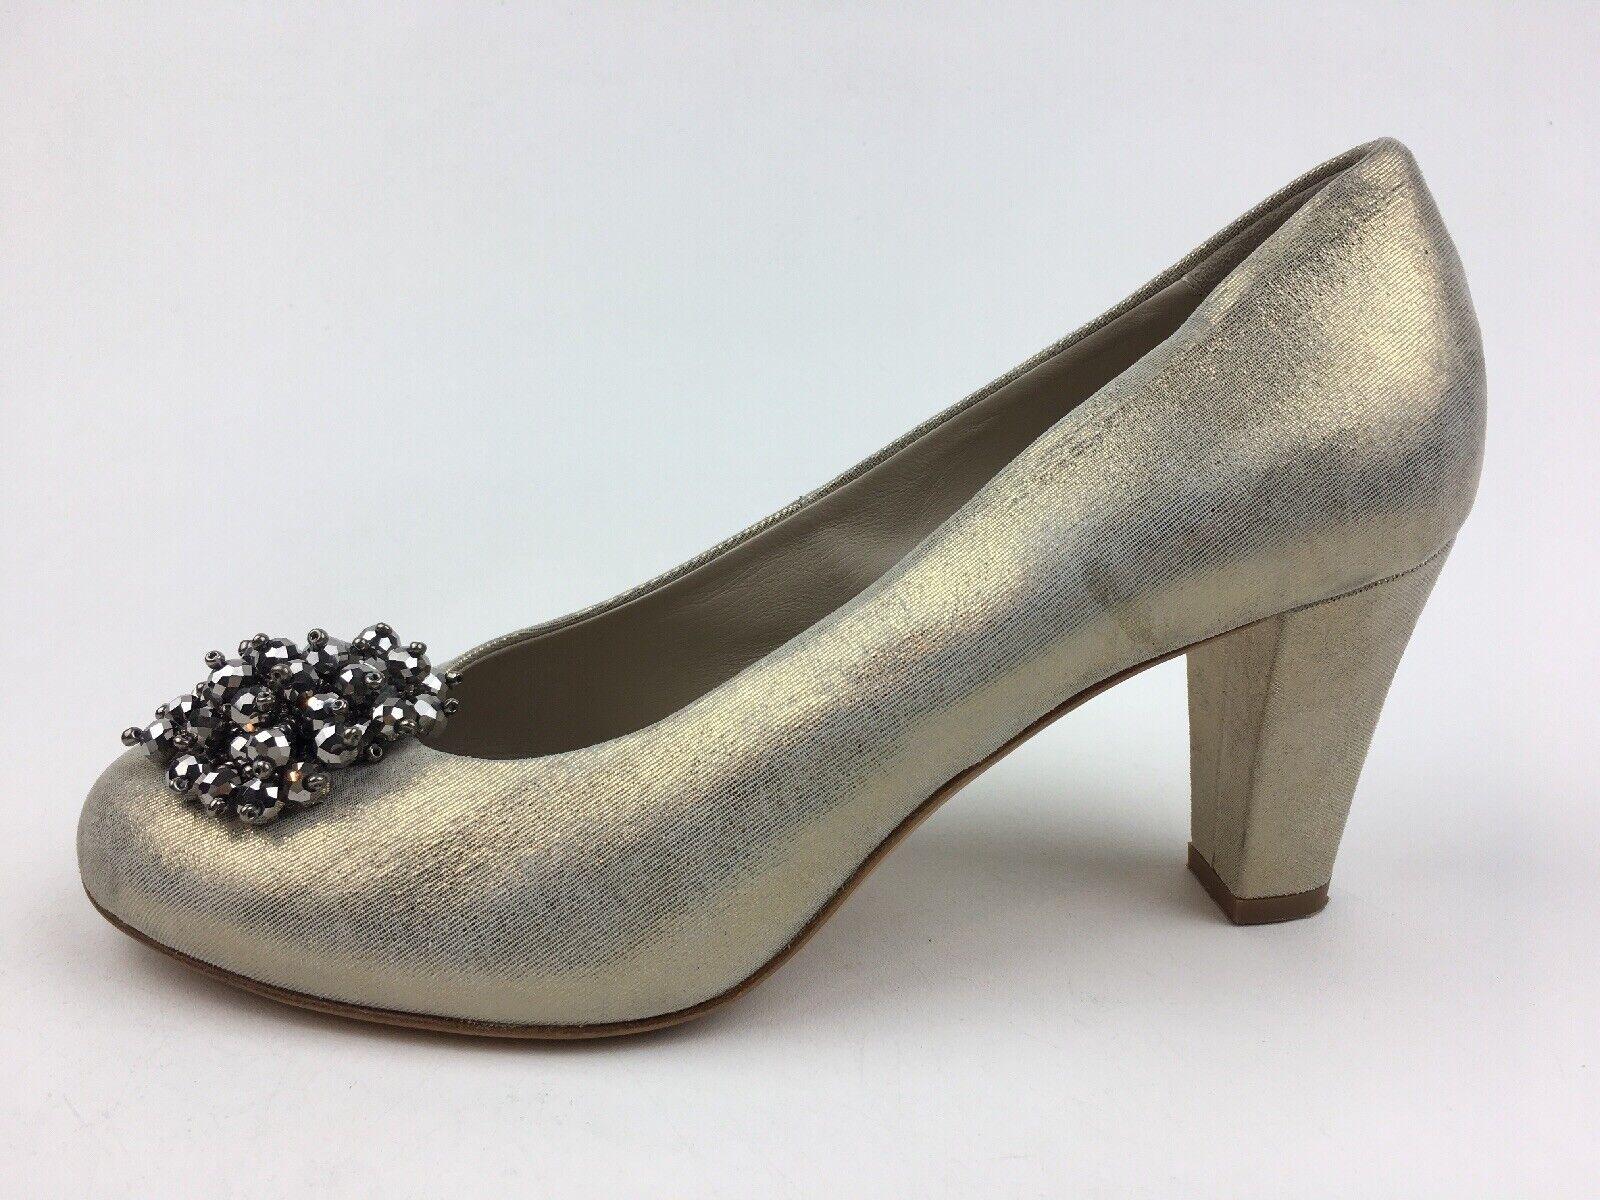 AGL Shimmer Flower Beaded Heel Pumps Size EUR 40, Beige Metallic 2481